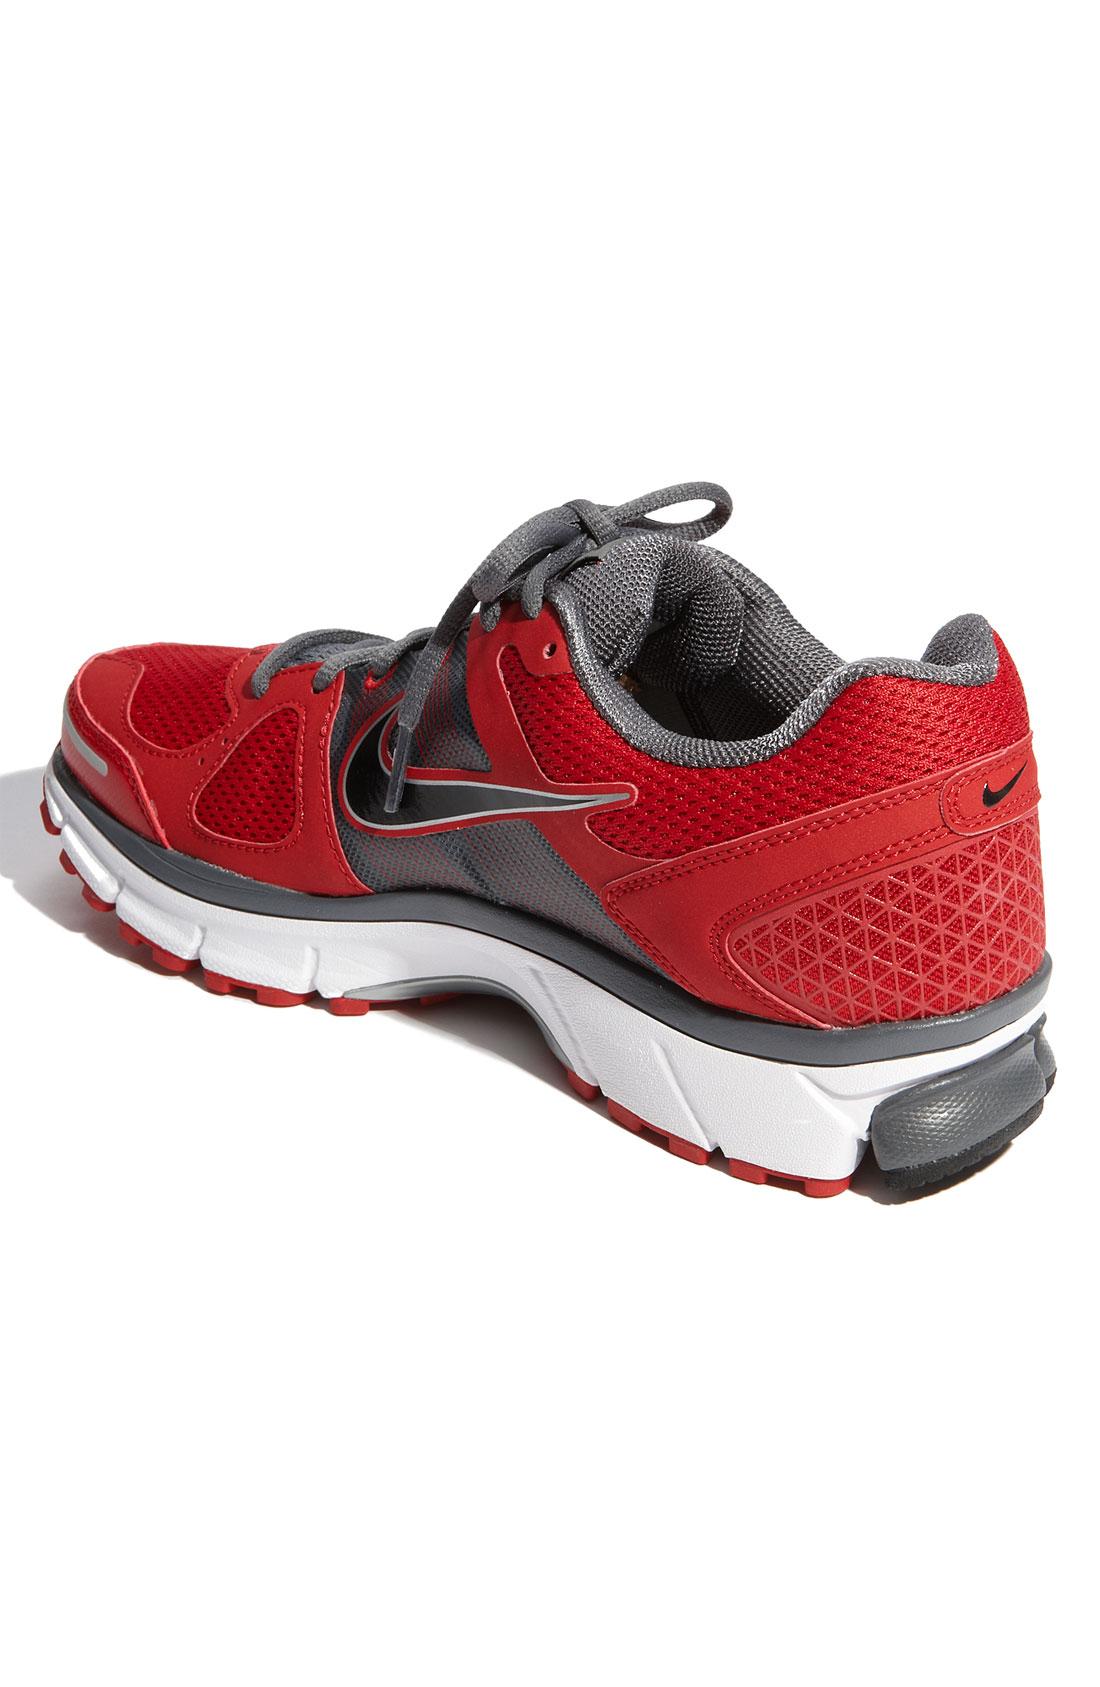 3ca8f623b47 Lyst - Nike Air Pegasus+ 28 Trail Running Shoe in Red for Men